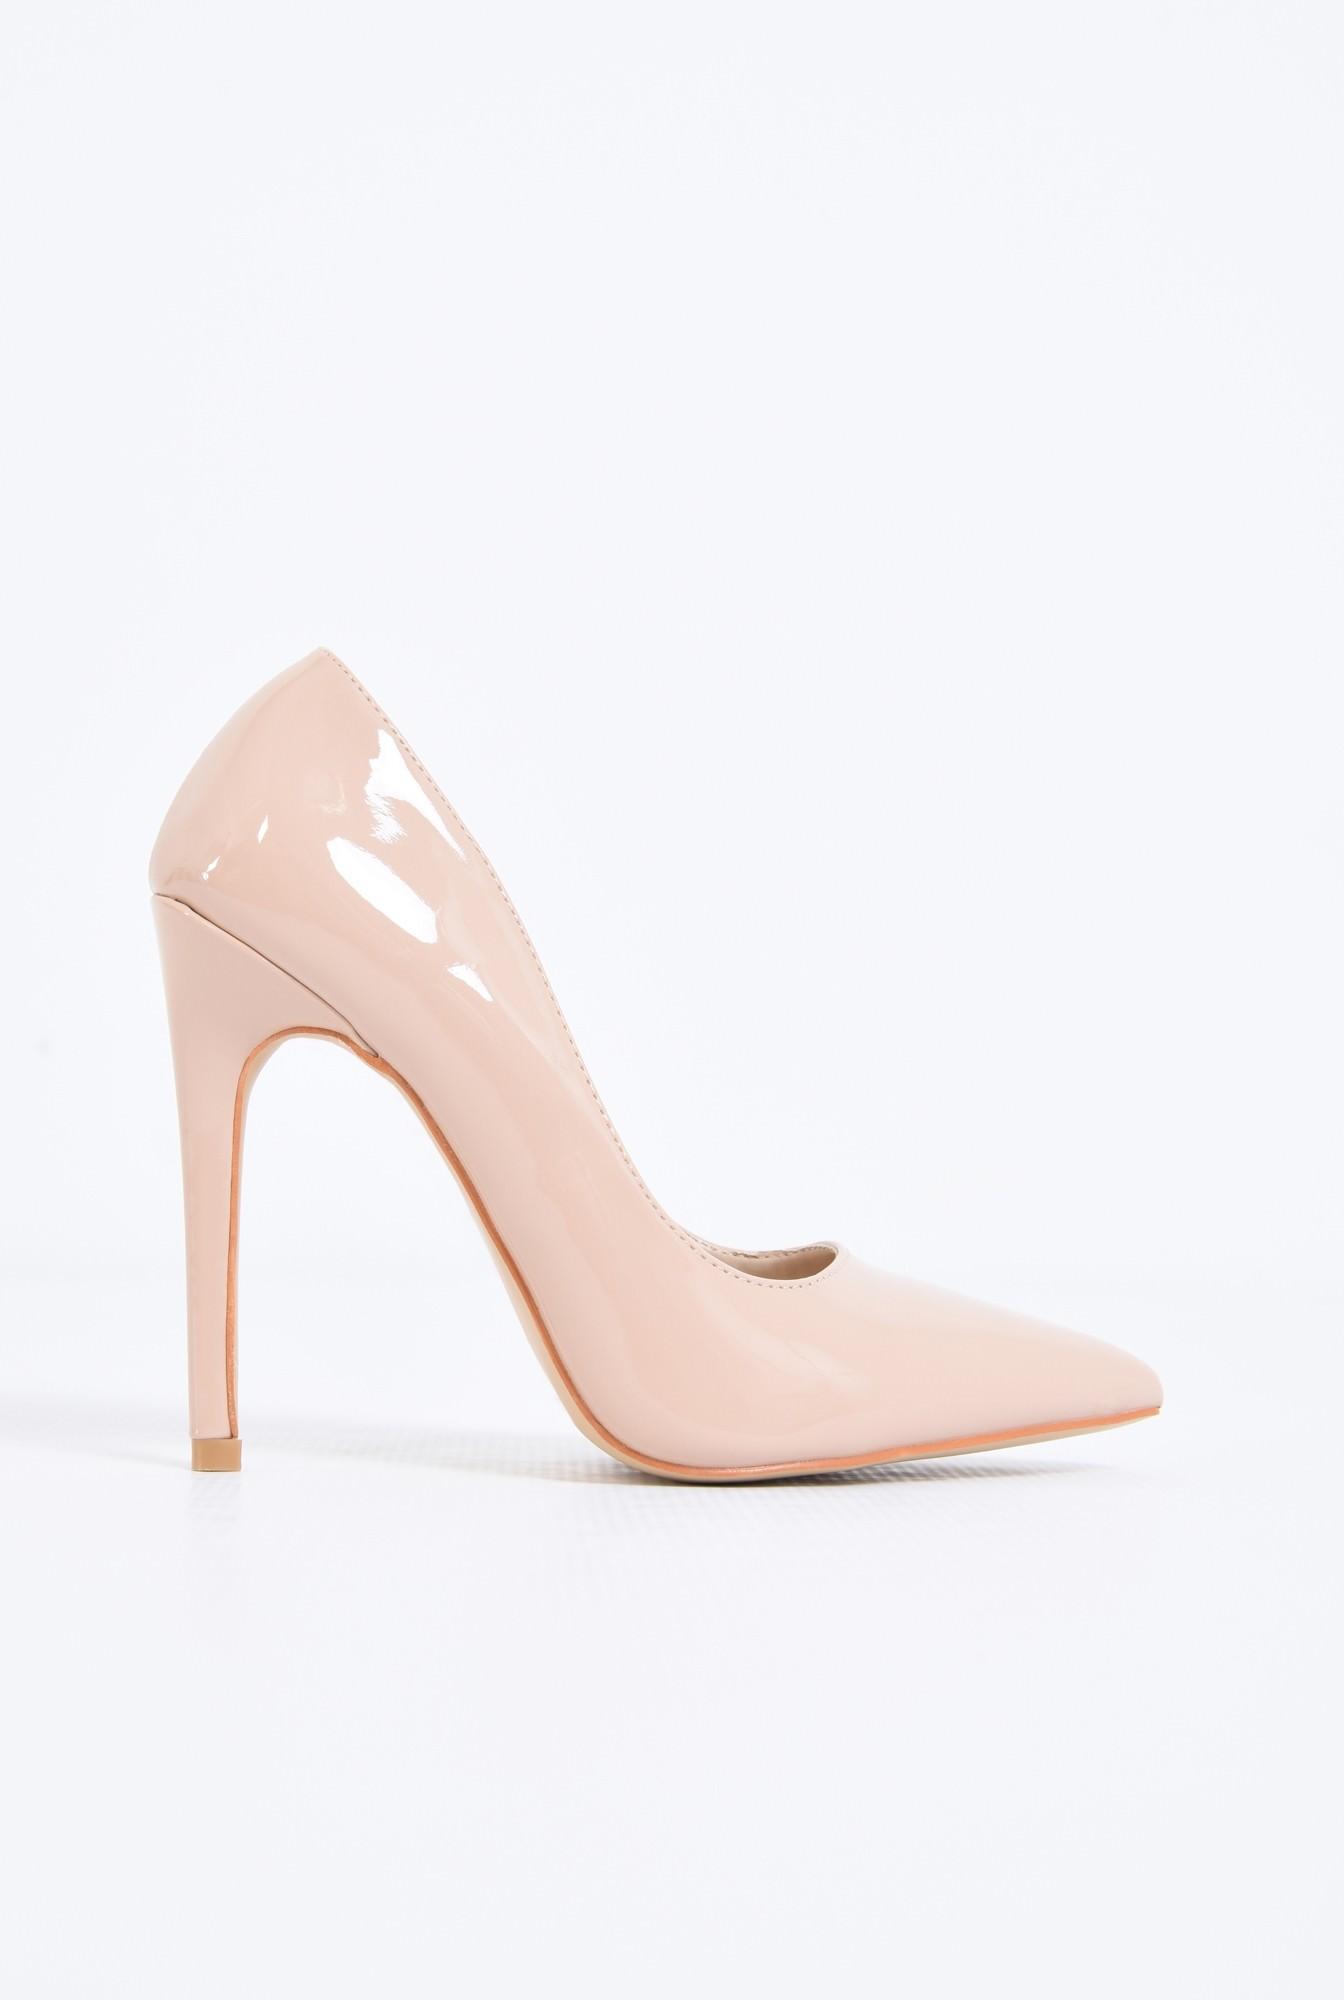 0 - pantofi eleganti, crem, toc inalt, varf ascutit